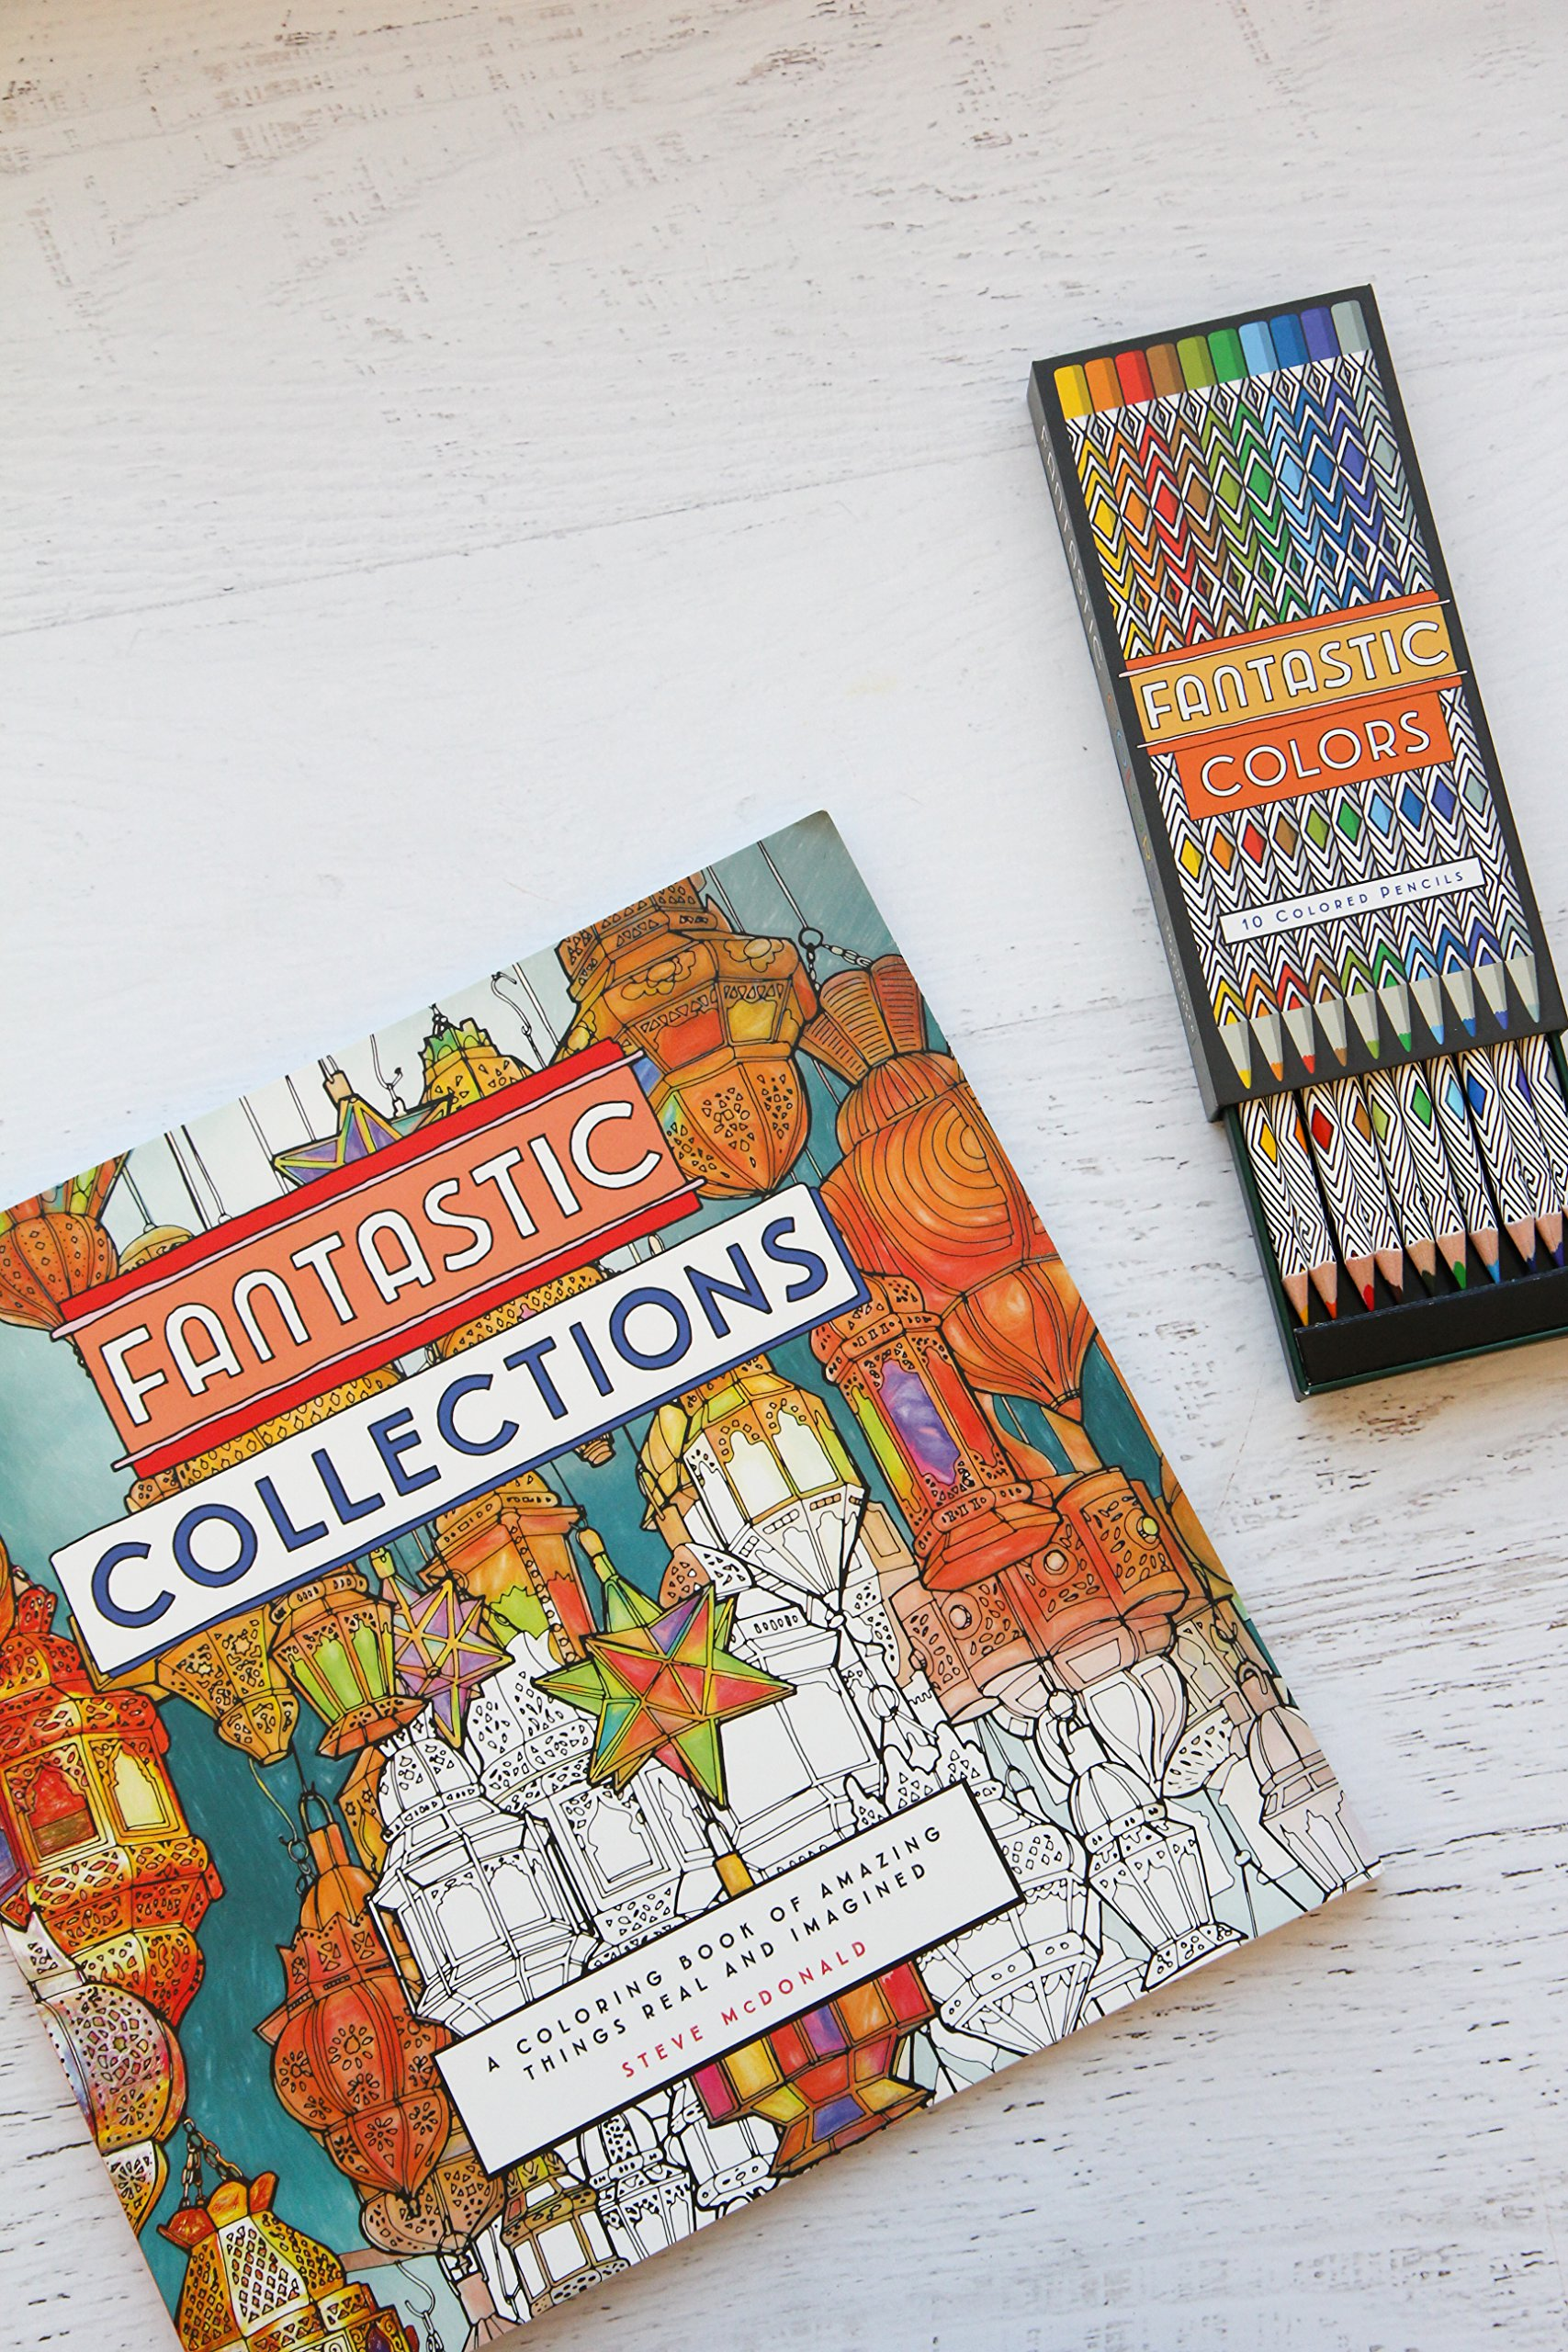 Fantastic Colors 10 Colored Pencils Steve McDonald 9781452159096 Amazon Books